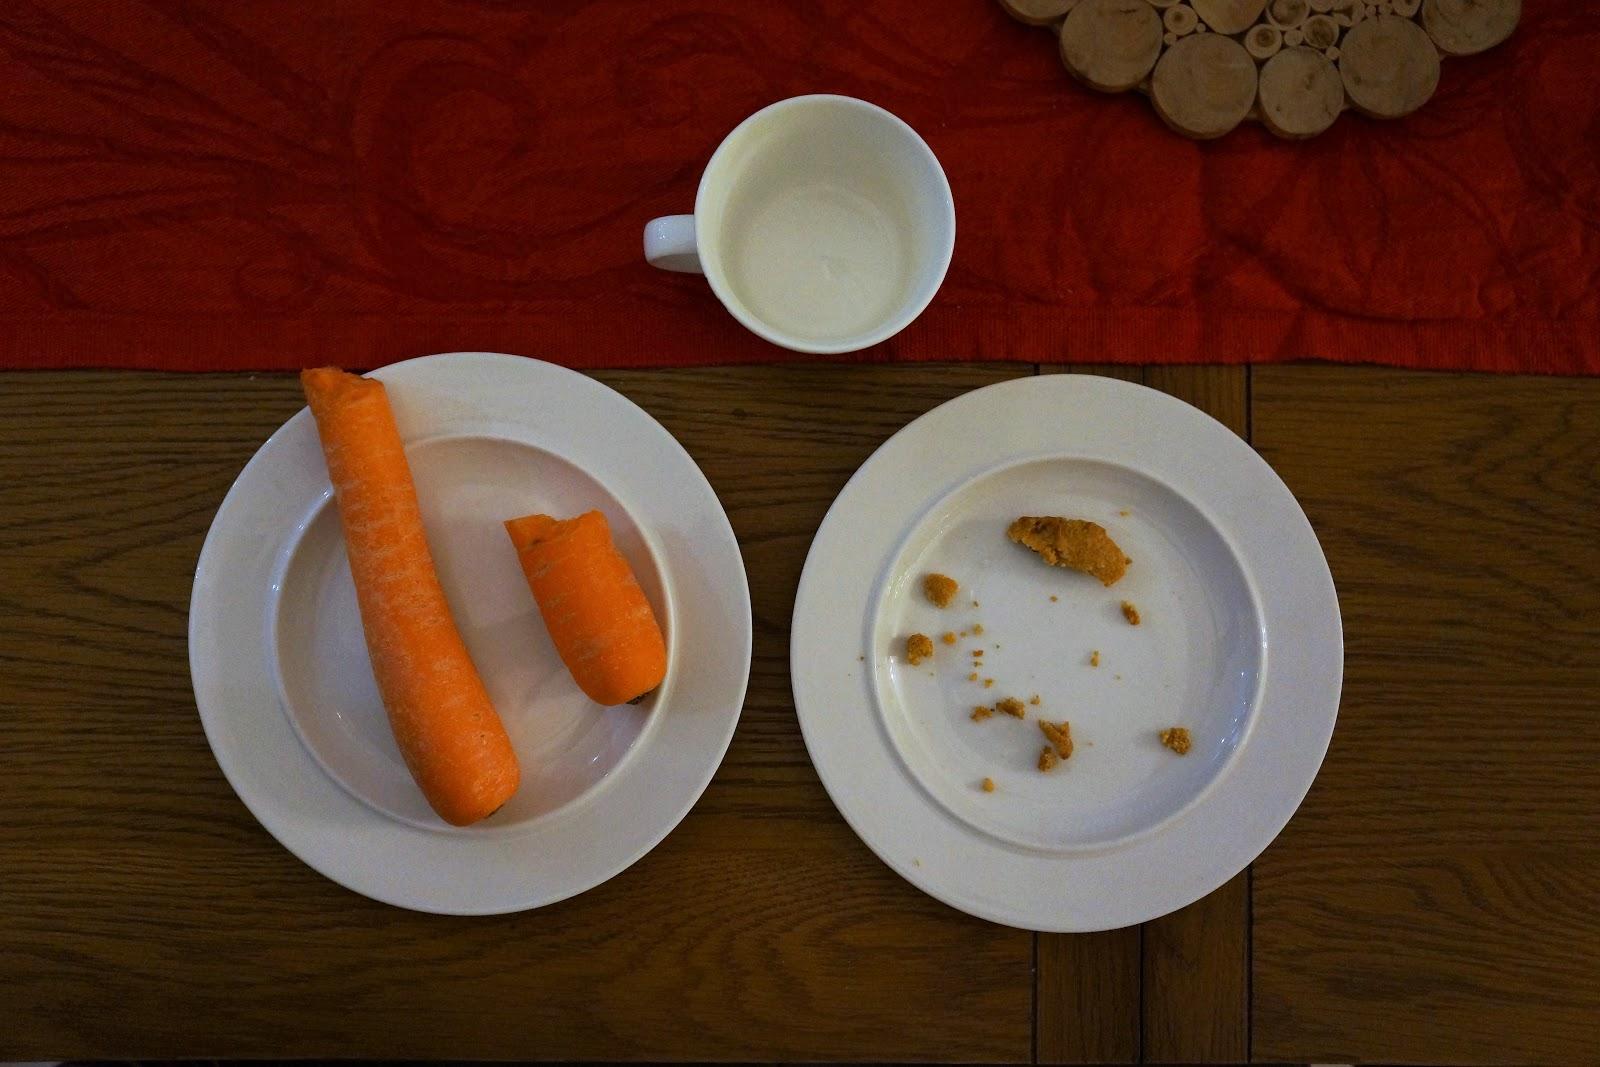 santas snack plate